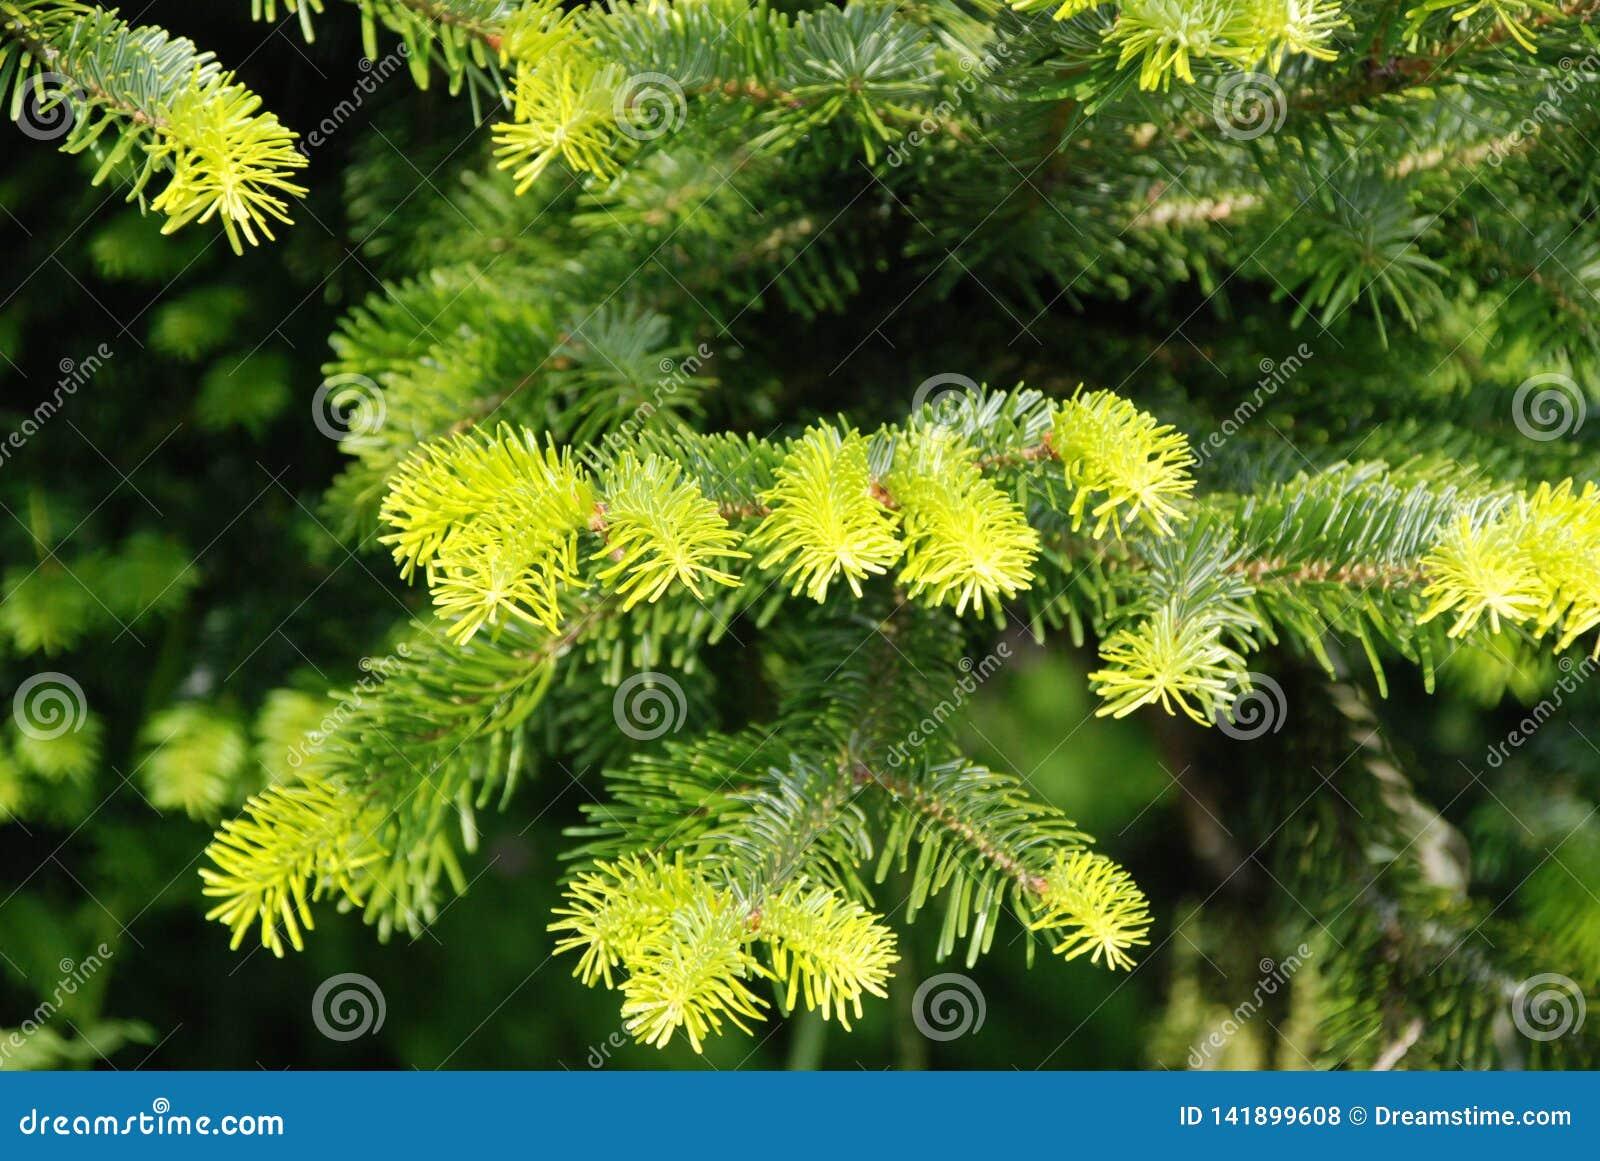 Fresh Green Needles on Christmas Tree